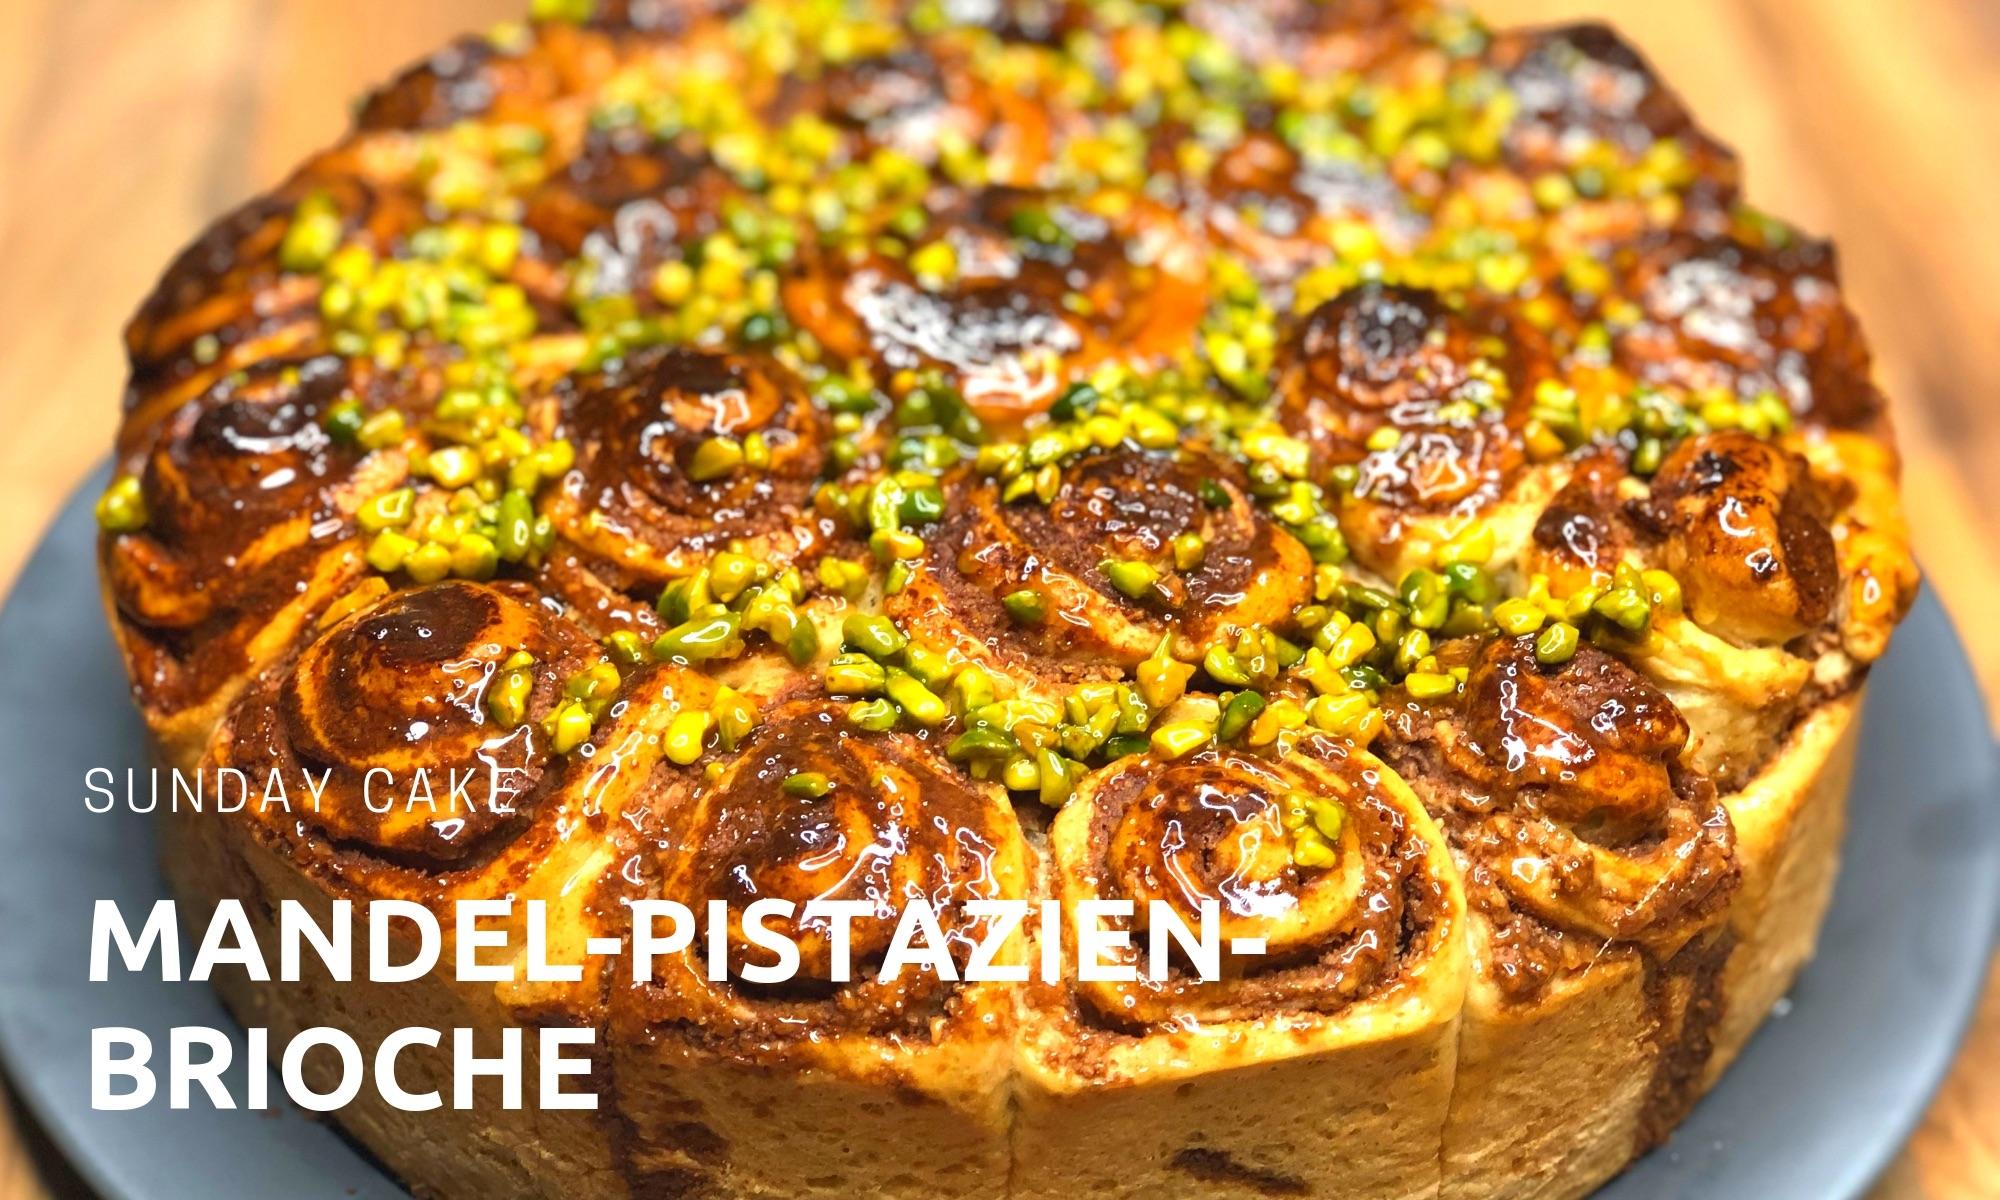 Mandel-Pistazien Brioche